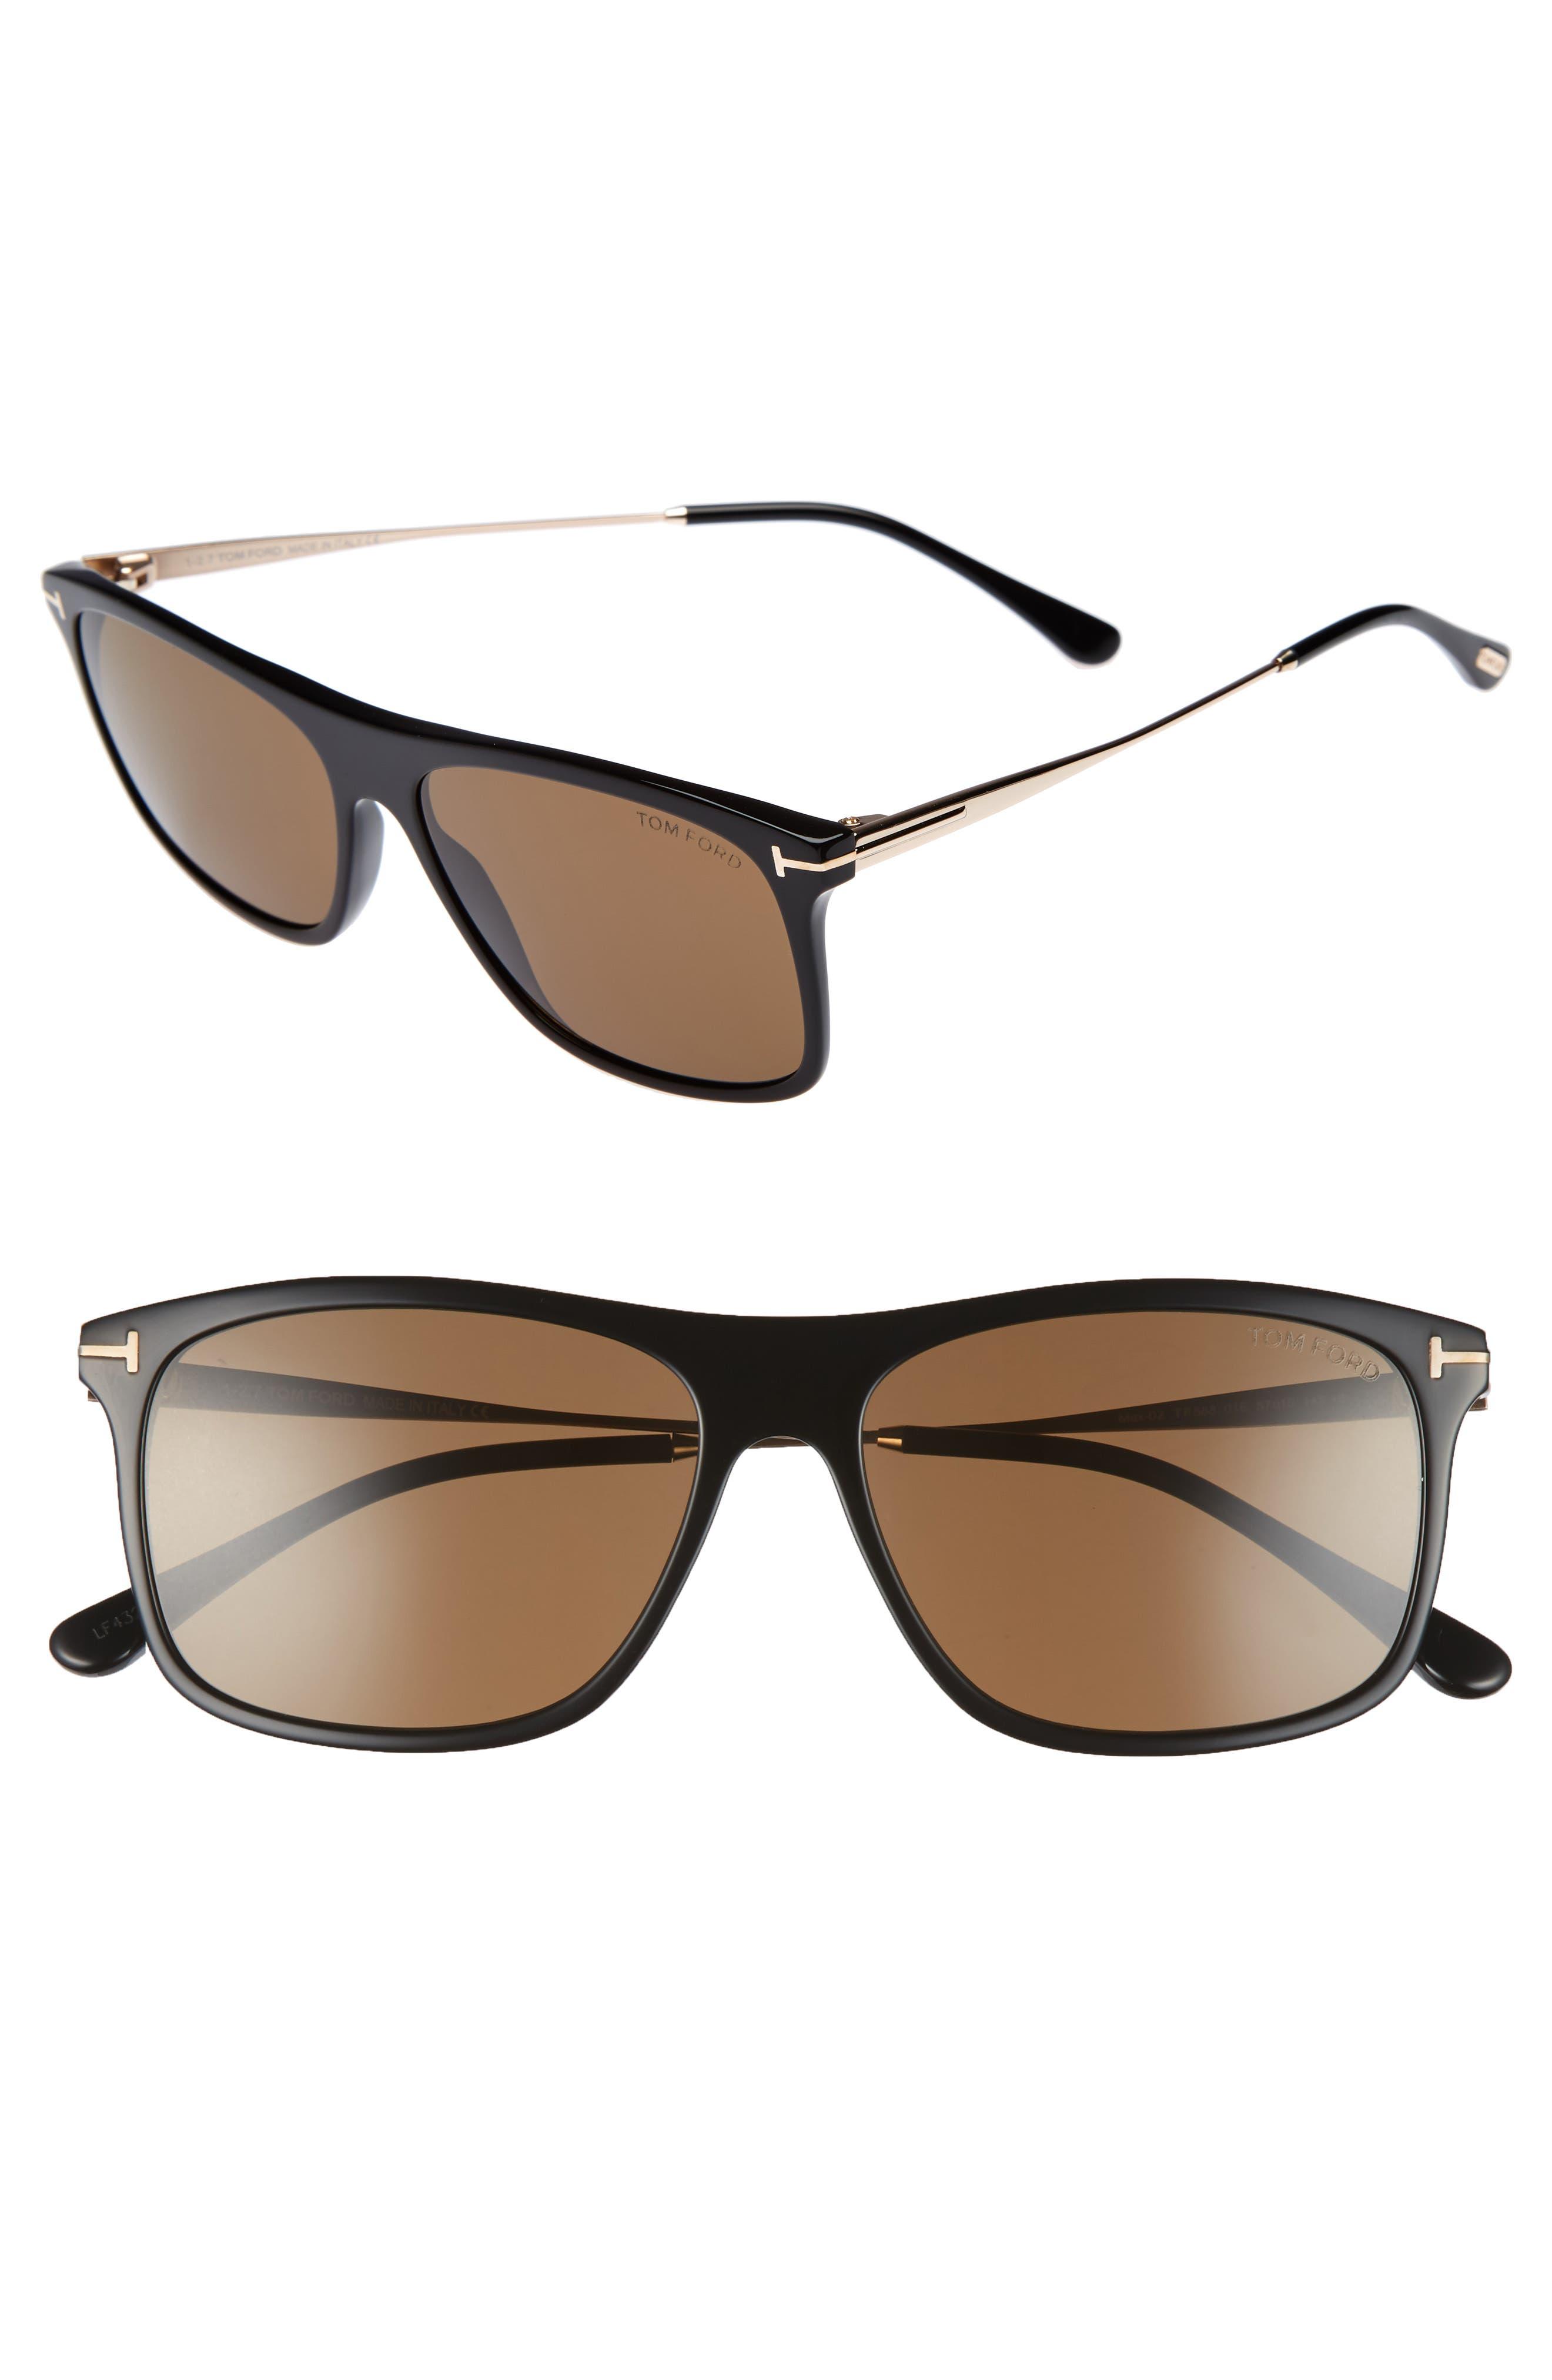 Tom Ford Max 57mm Sunglasses